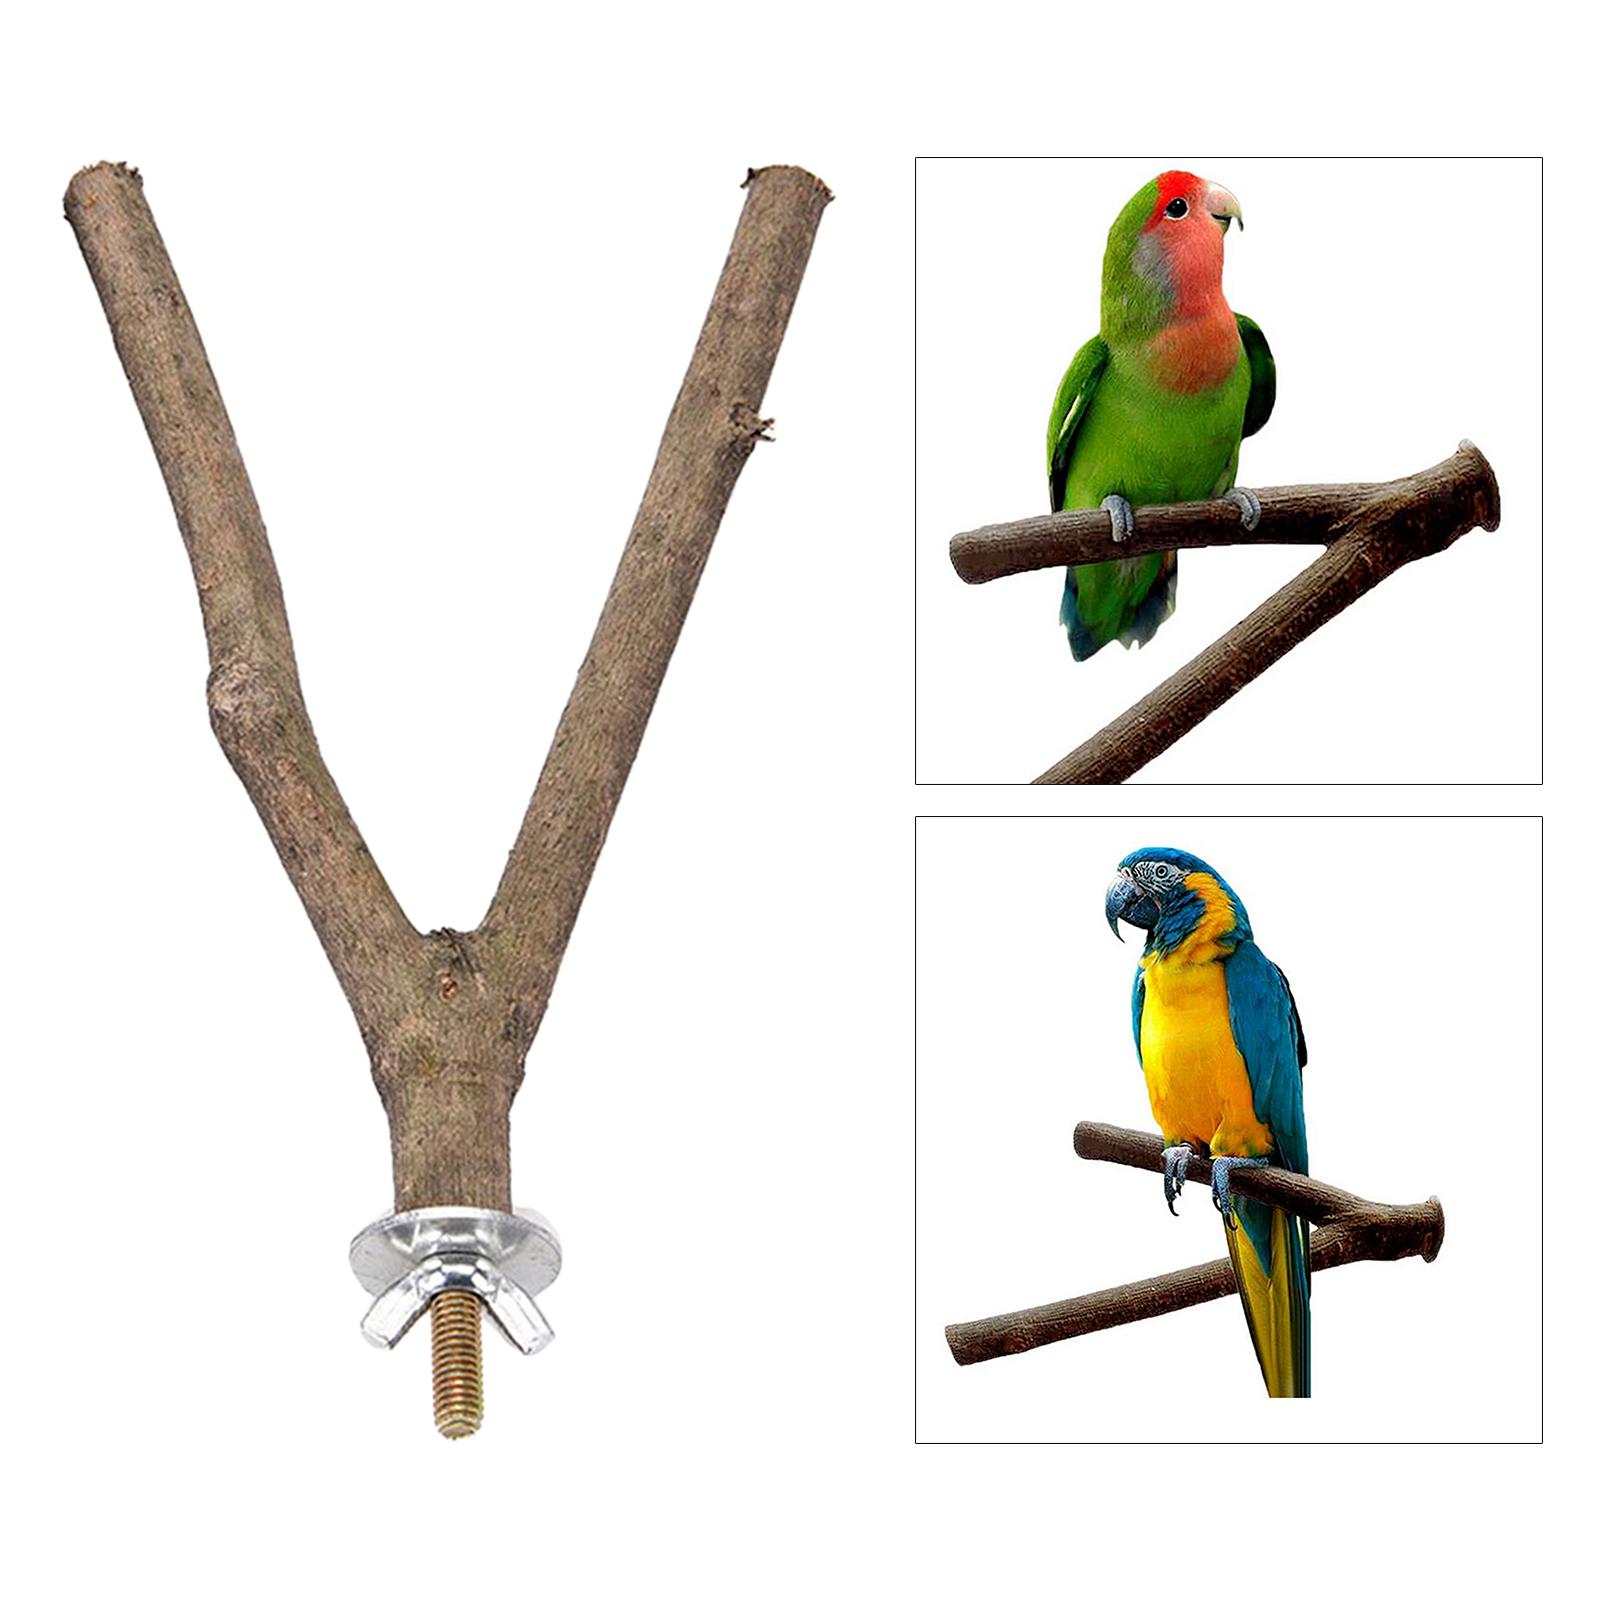 thumbnail 21 - Bird-Perch-Wood-Stand-Bird-Cage-Swing-Branch-for-Parrot-Parakeet-Cockatiel